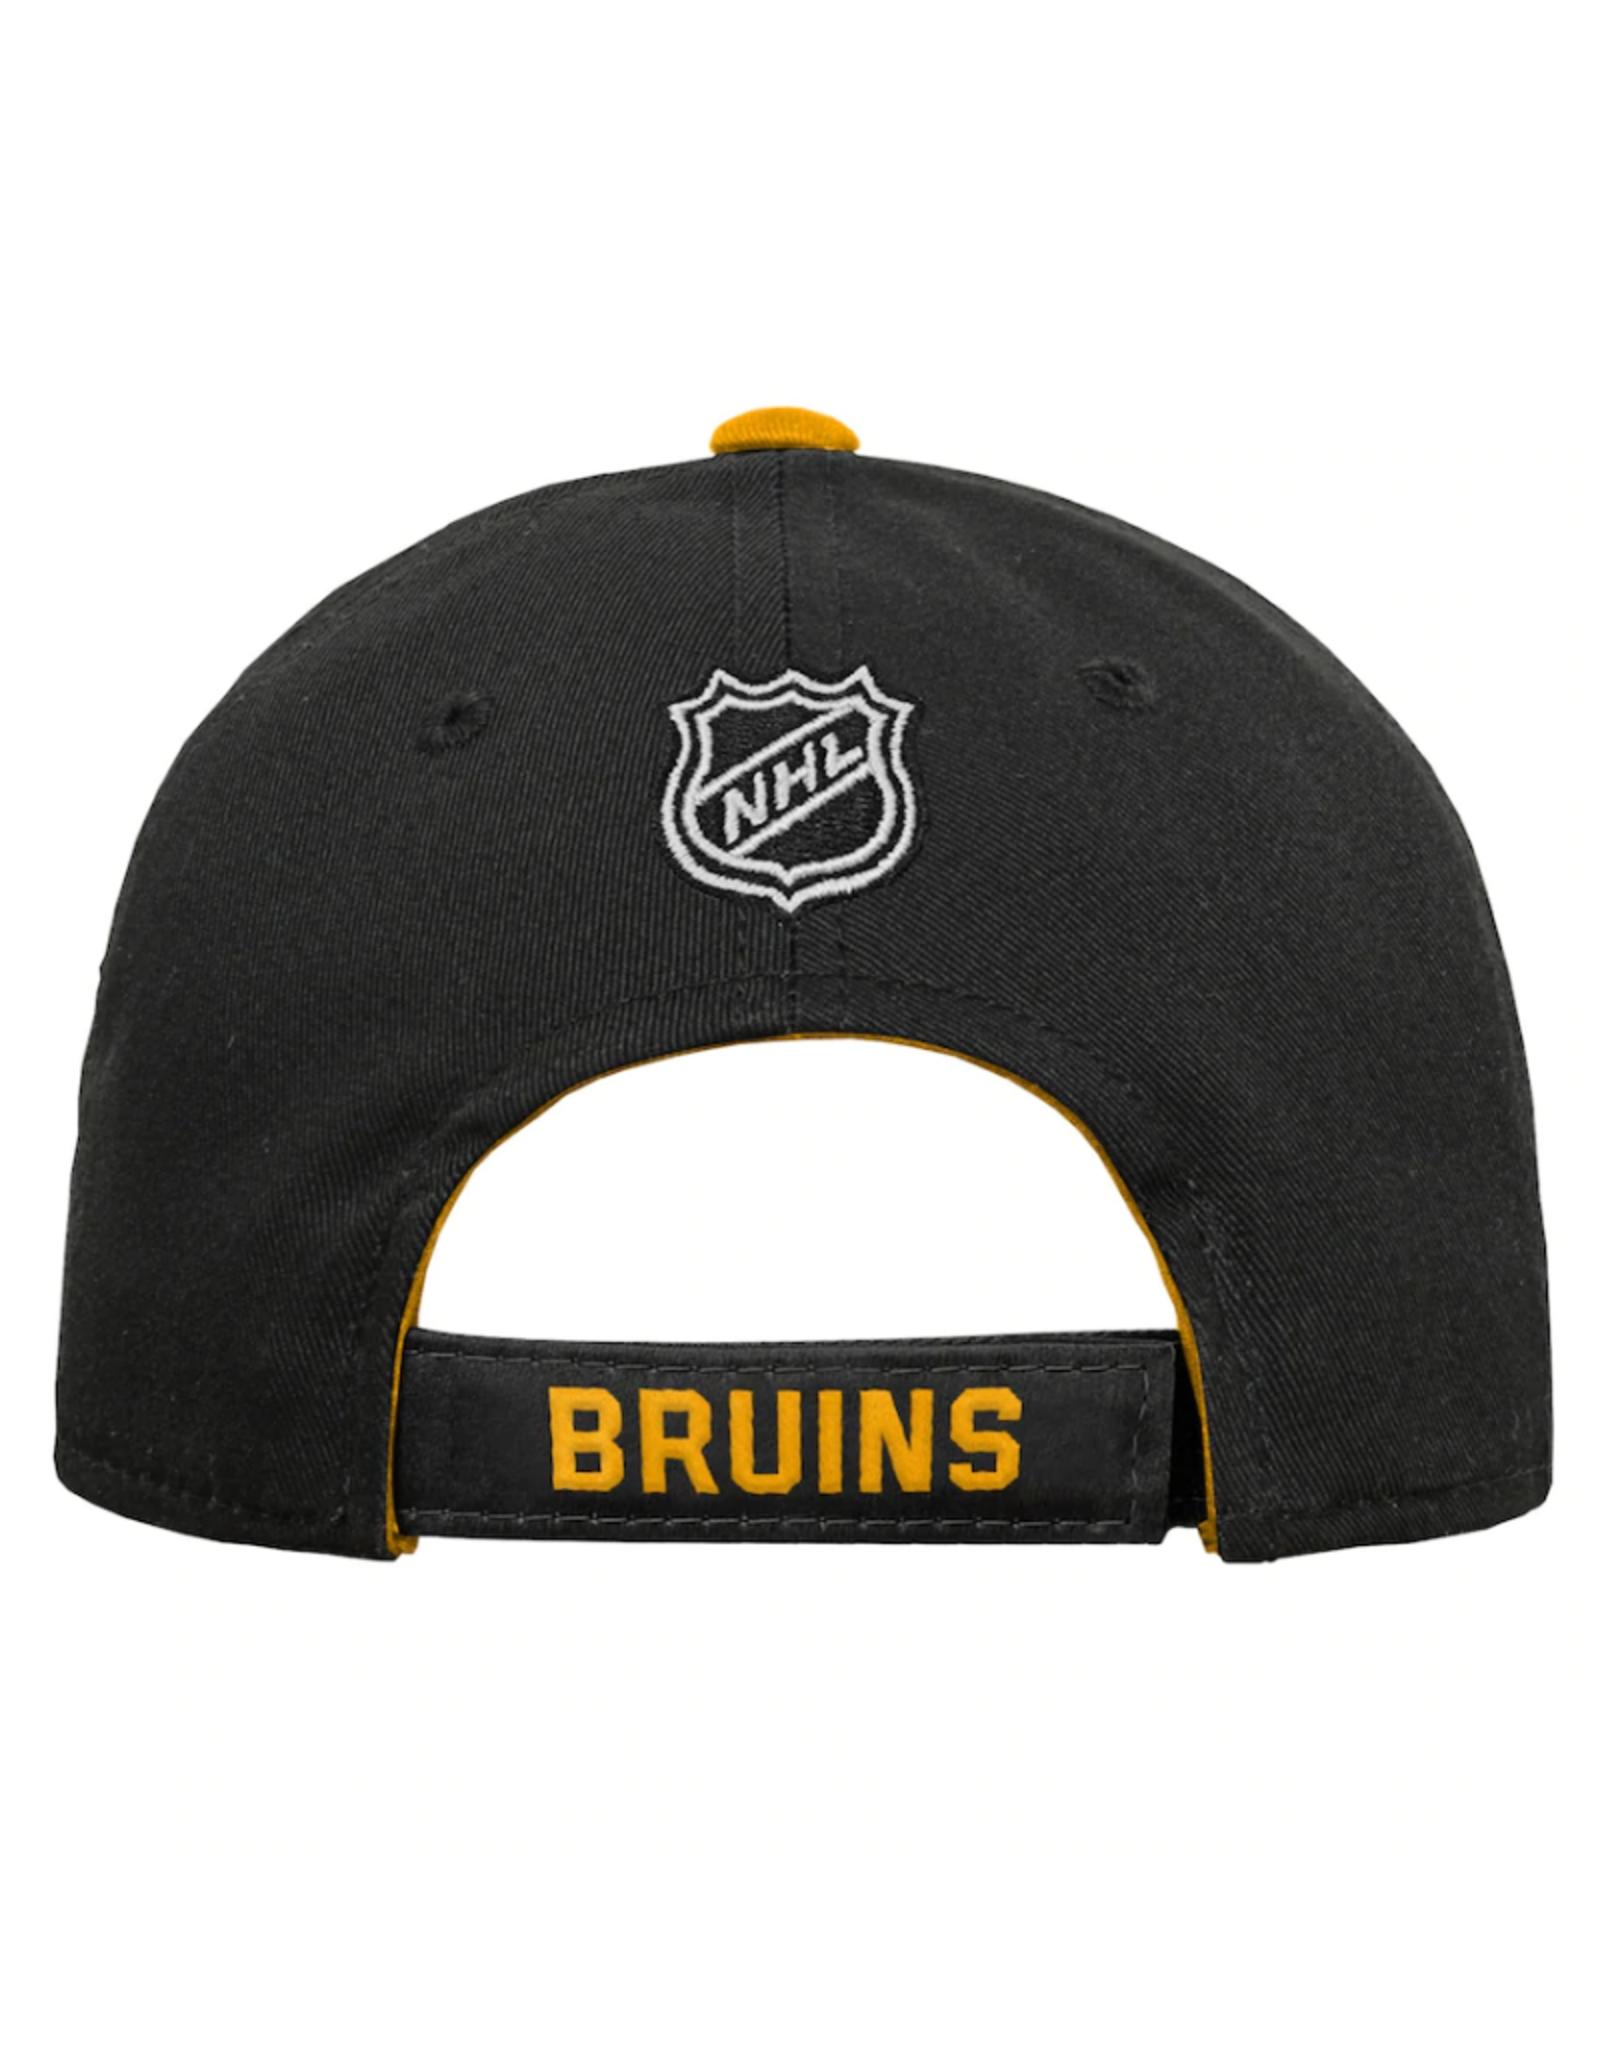 NHL Youth Basic Structured Adjustable Boston Bruins